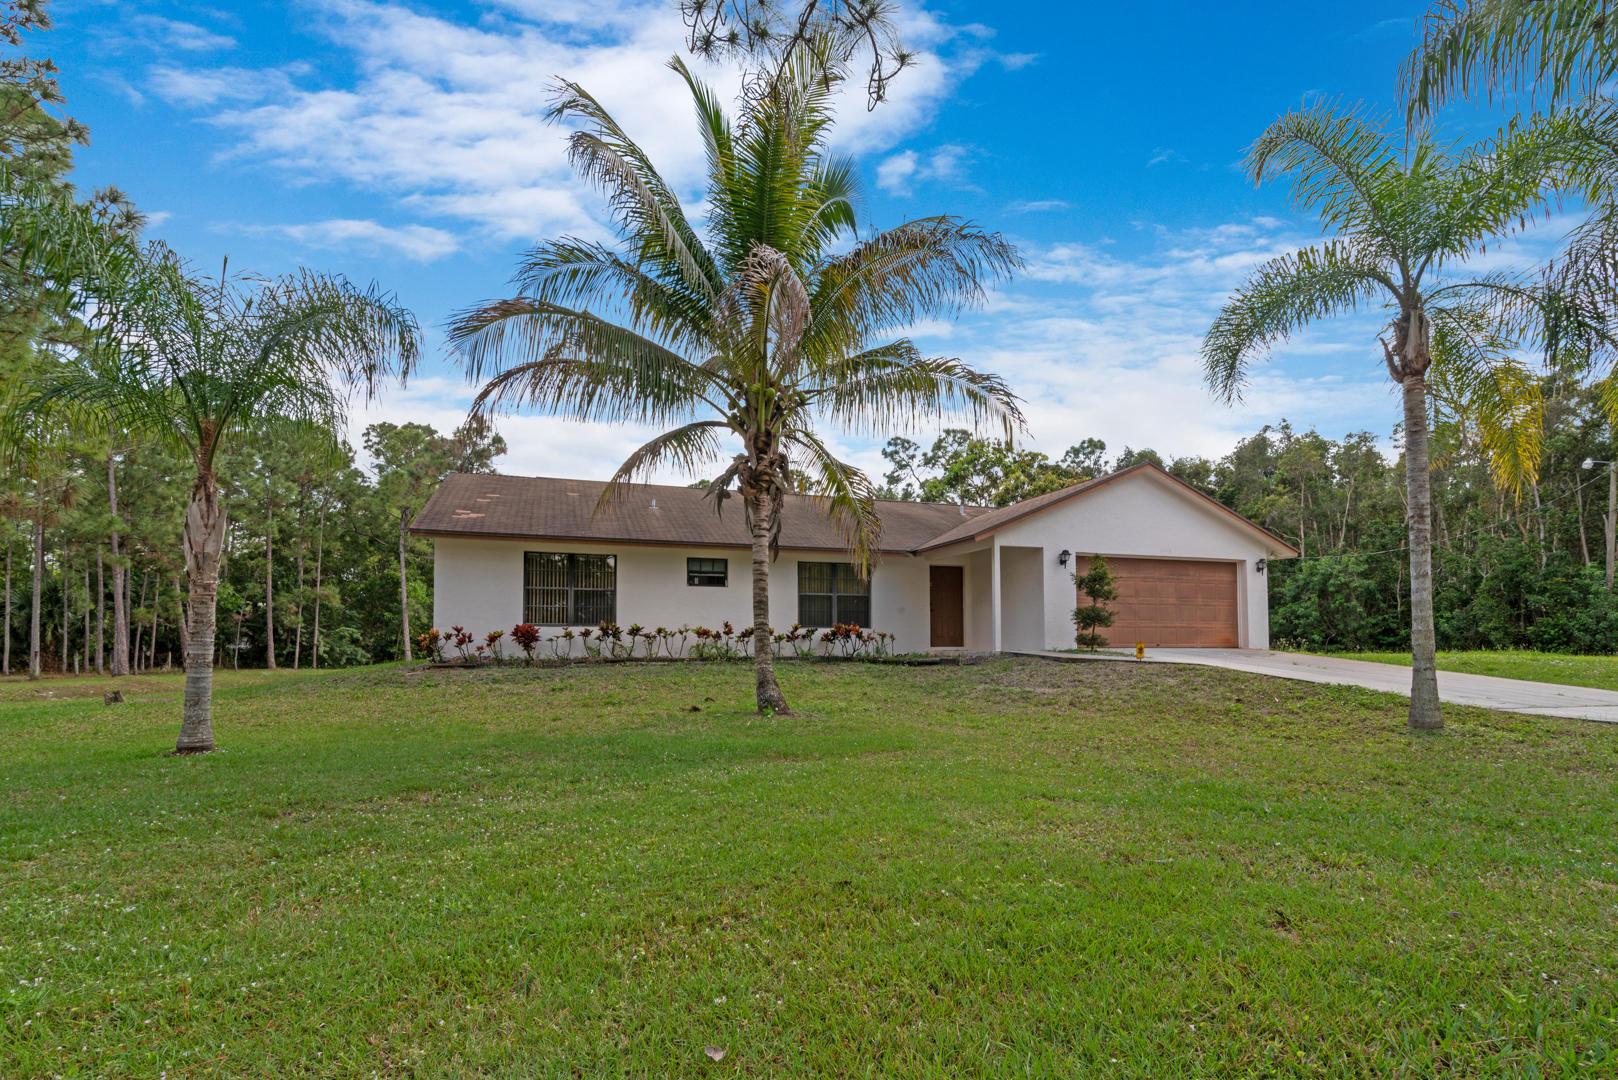 Photo of 13748 41st Lane N, West Palm Beach, FL 33411